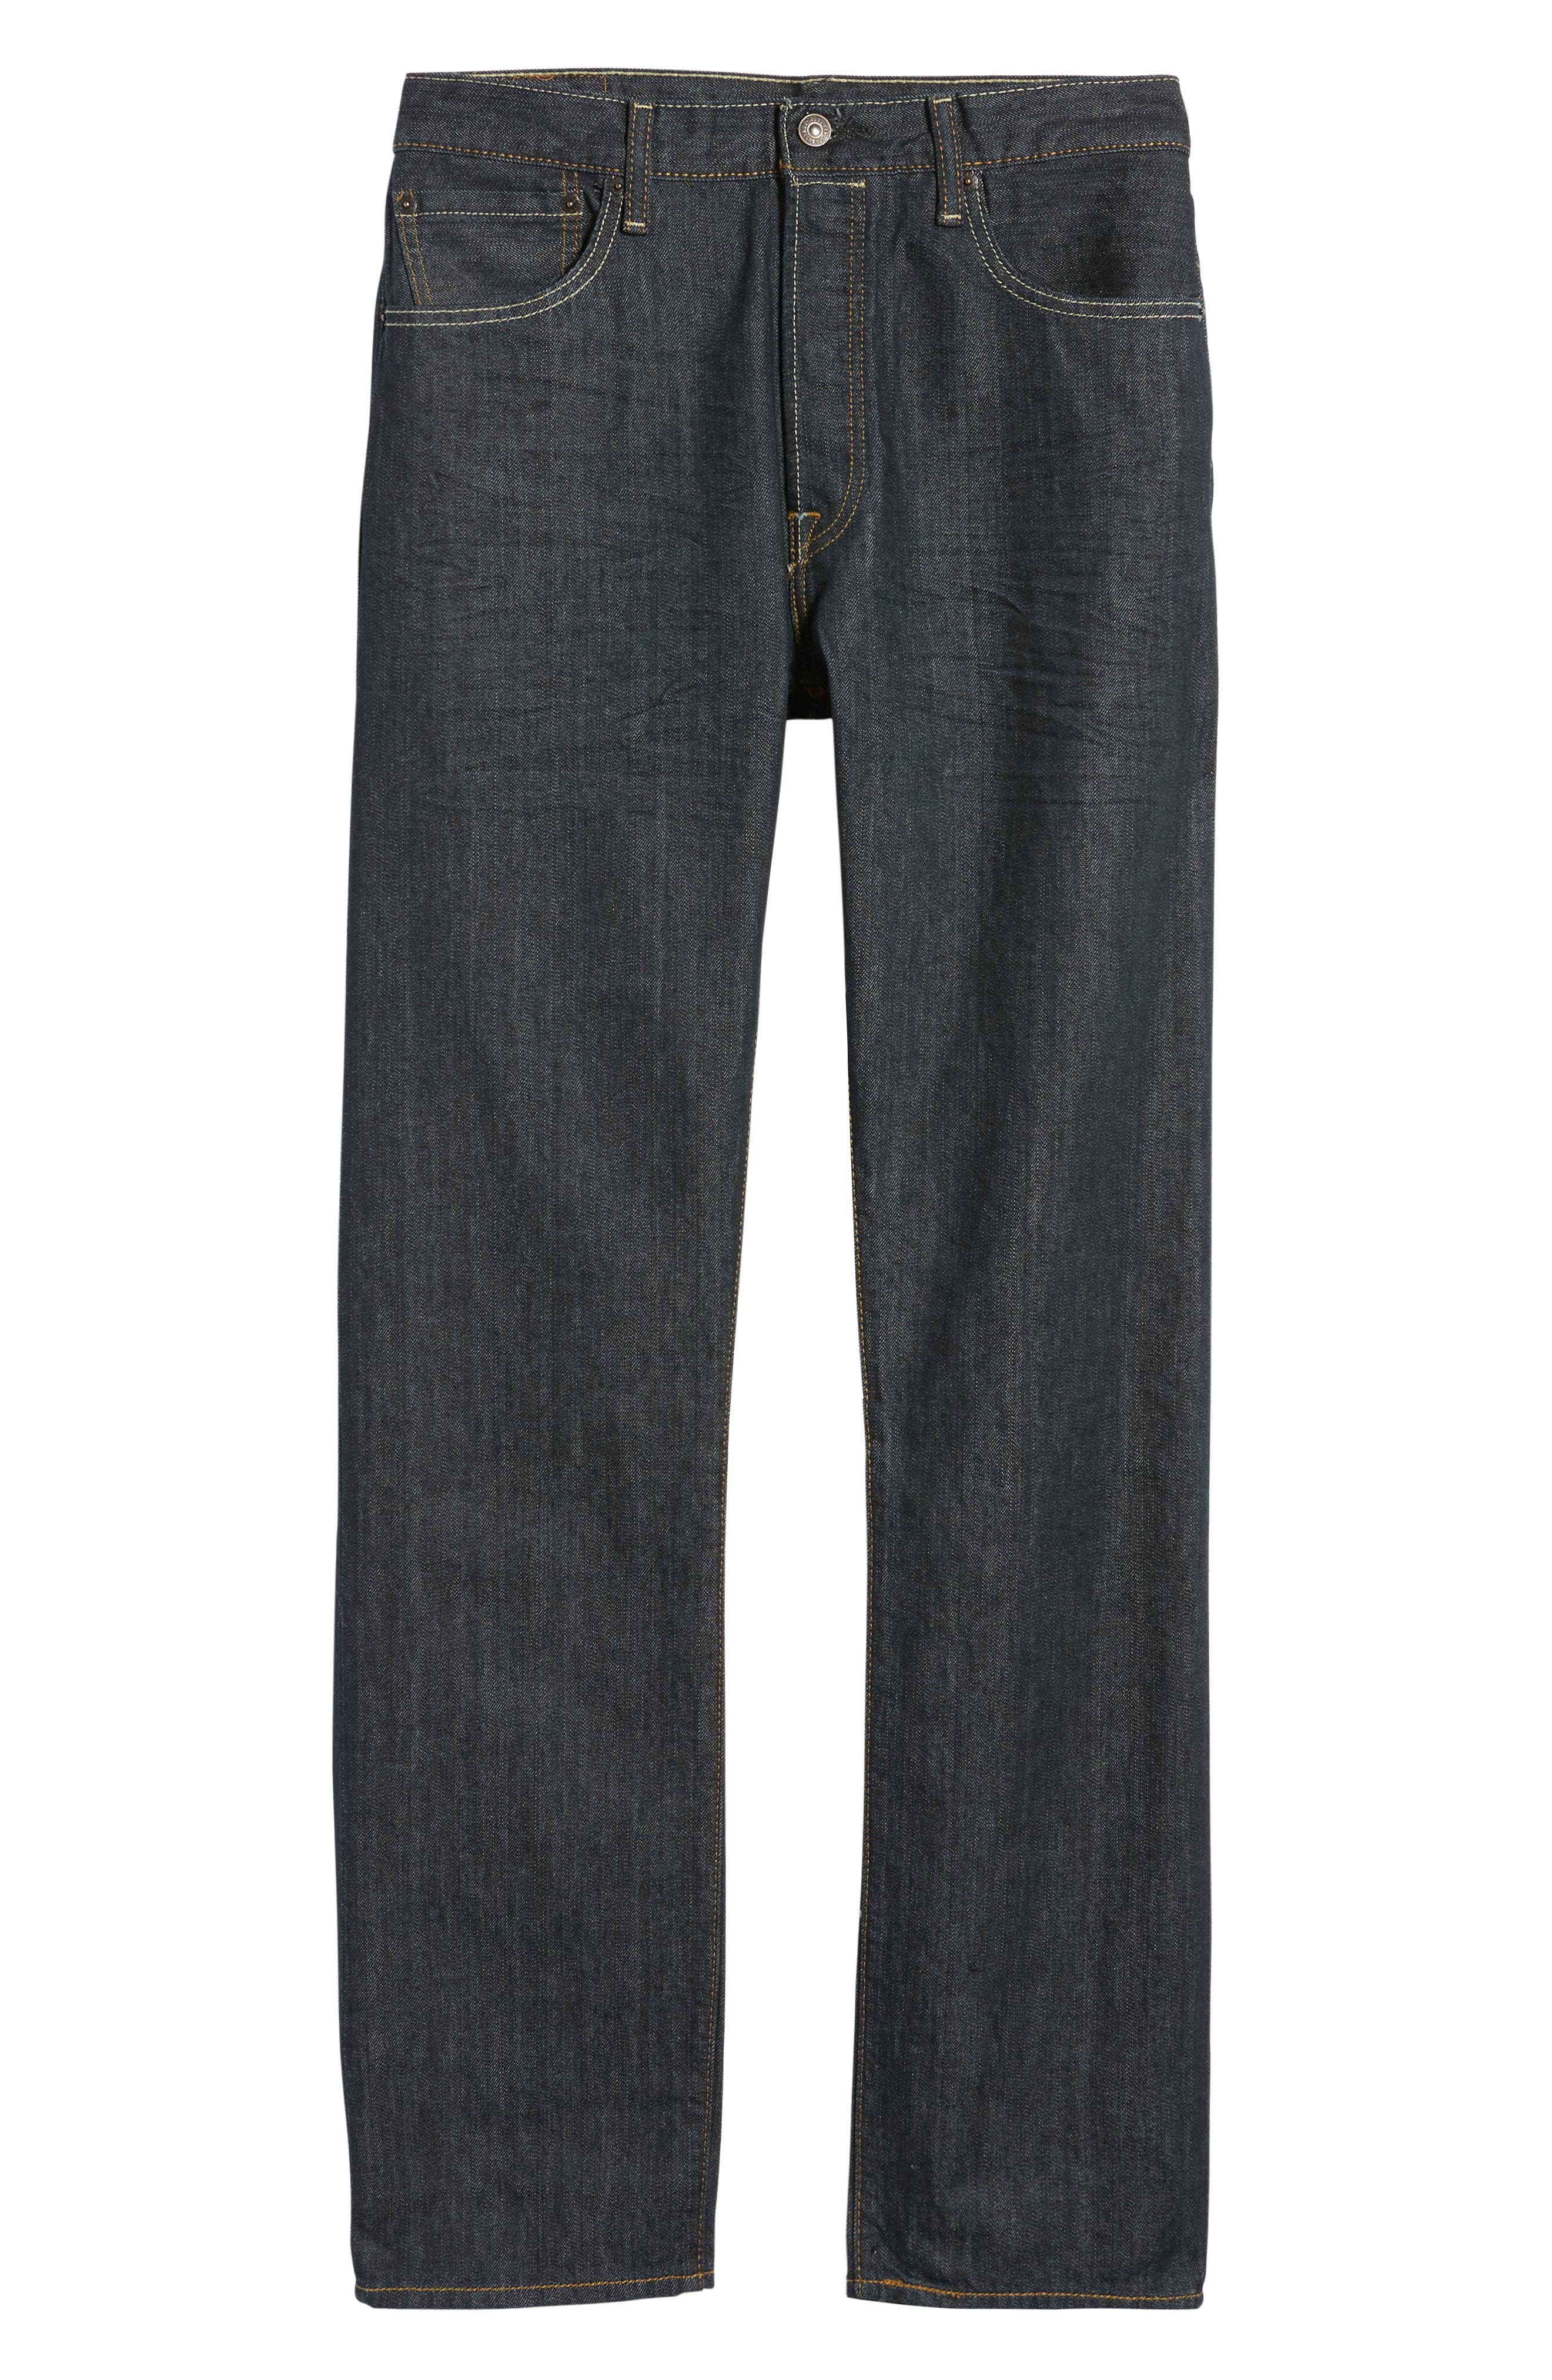 Men's Levi's Red Tab(TM) '501' Straight Leg Jeans